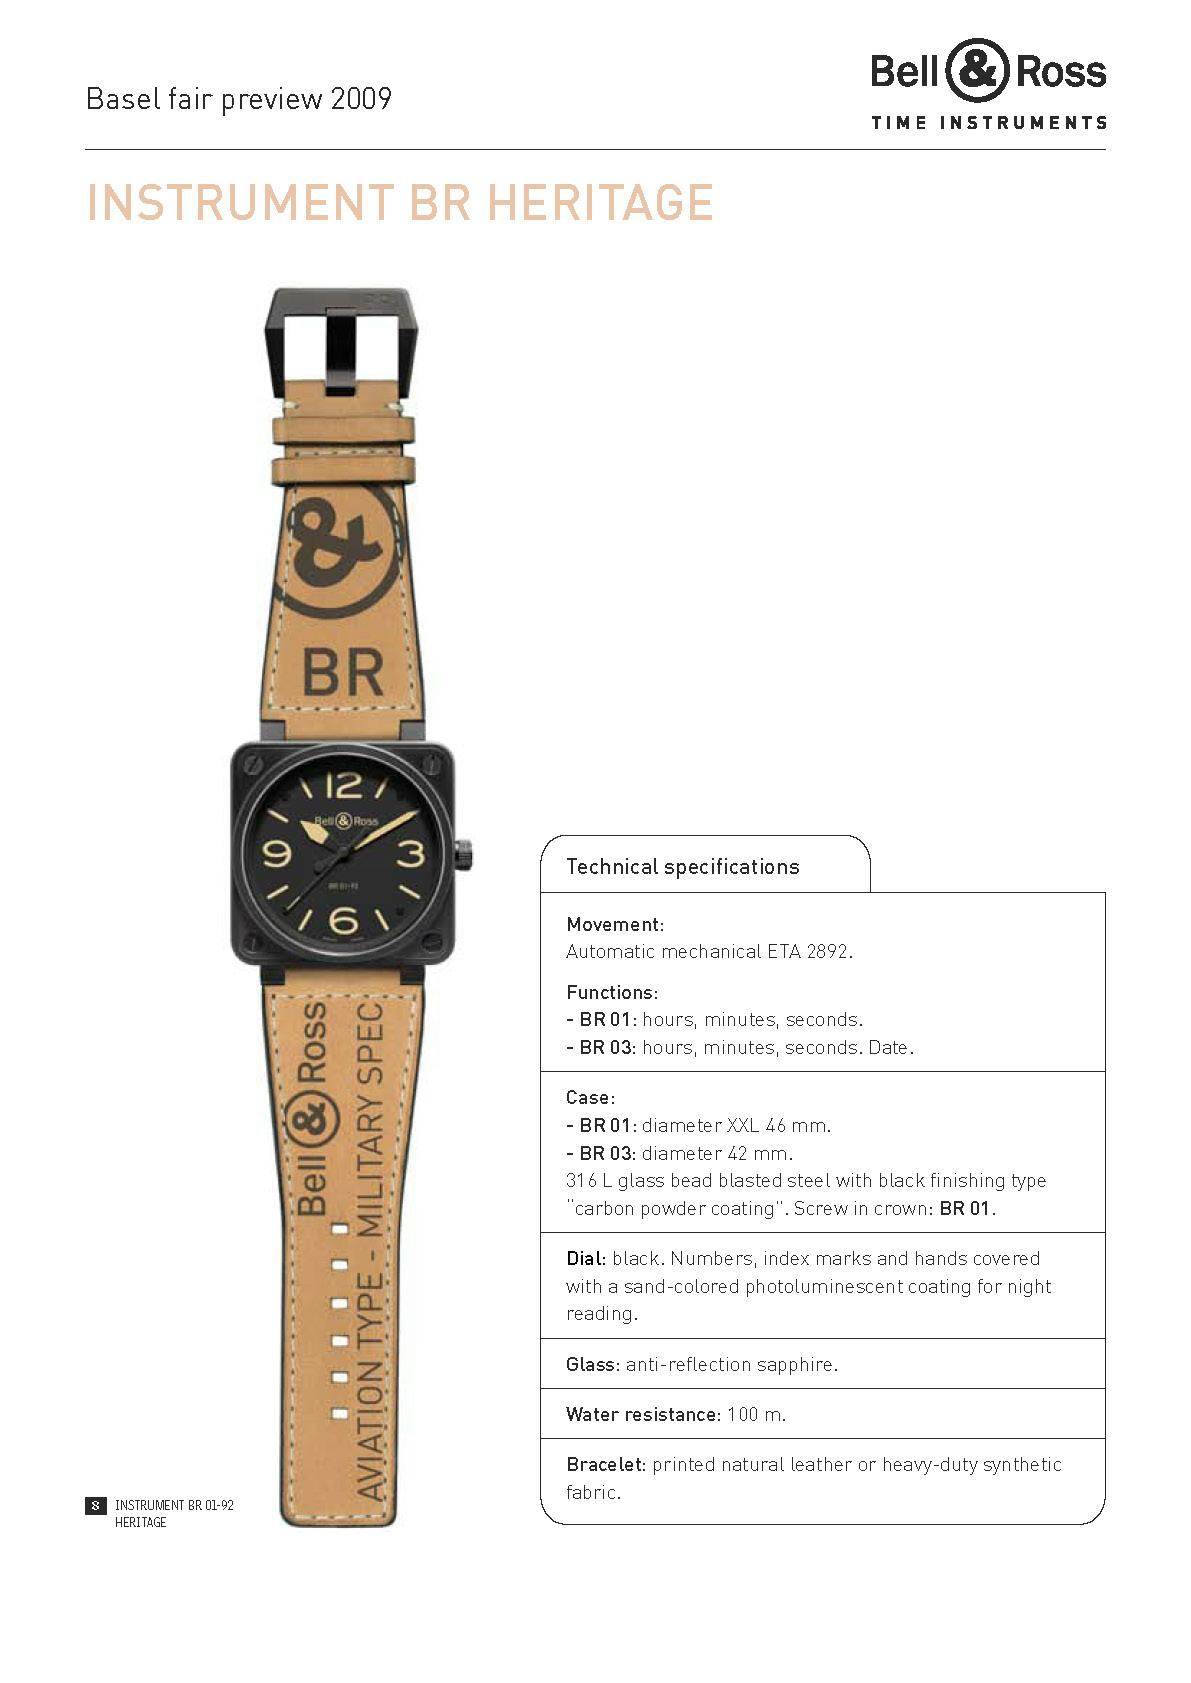 News: BR 01-92 Heritage Brheritagedoc2